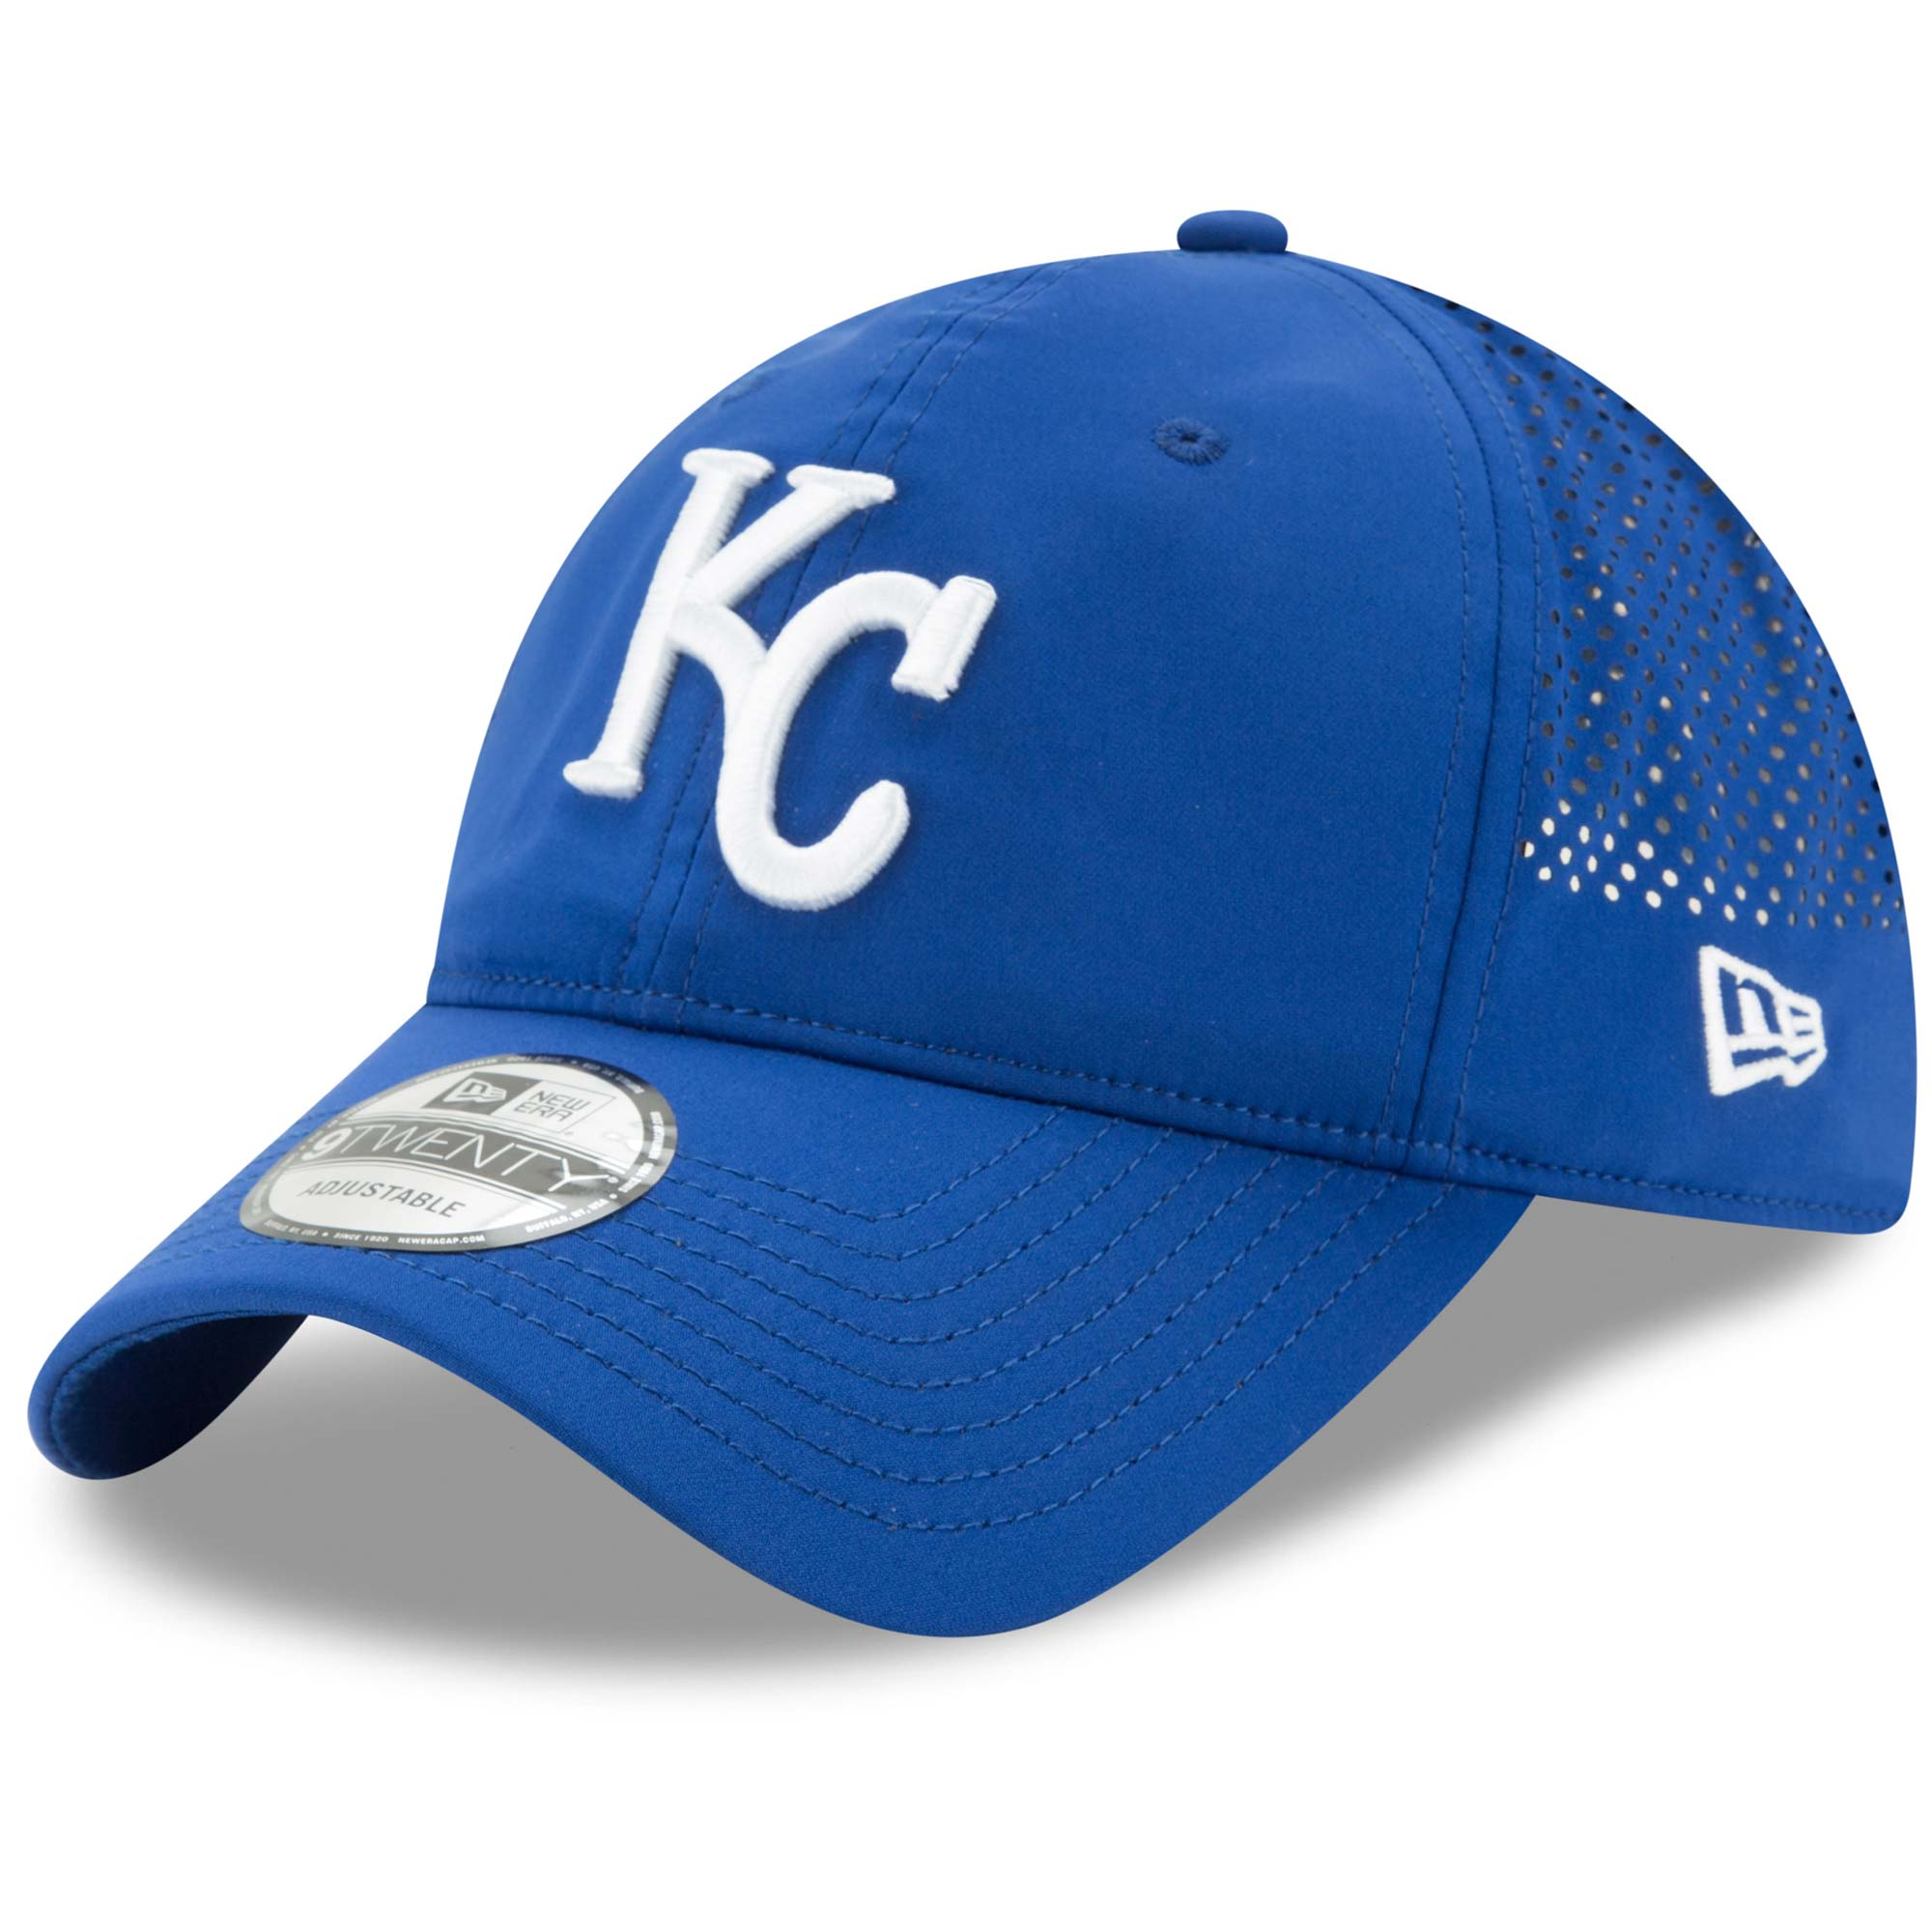 Kansas City Royals New Era Perforated Pivot 2 9TWENTY Adjustable Hat - Royal - OSFA